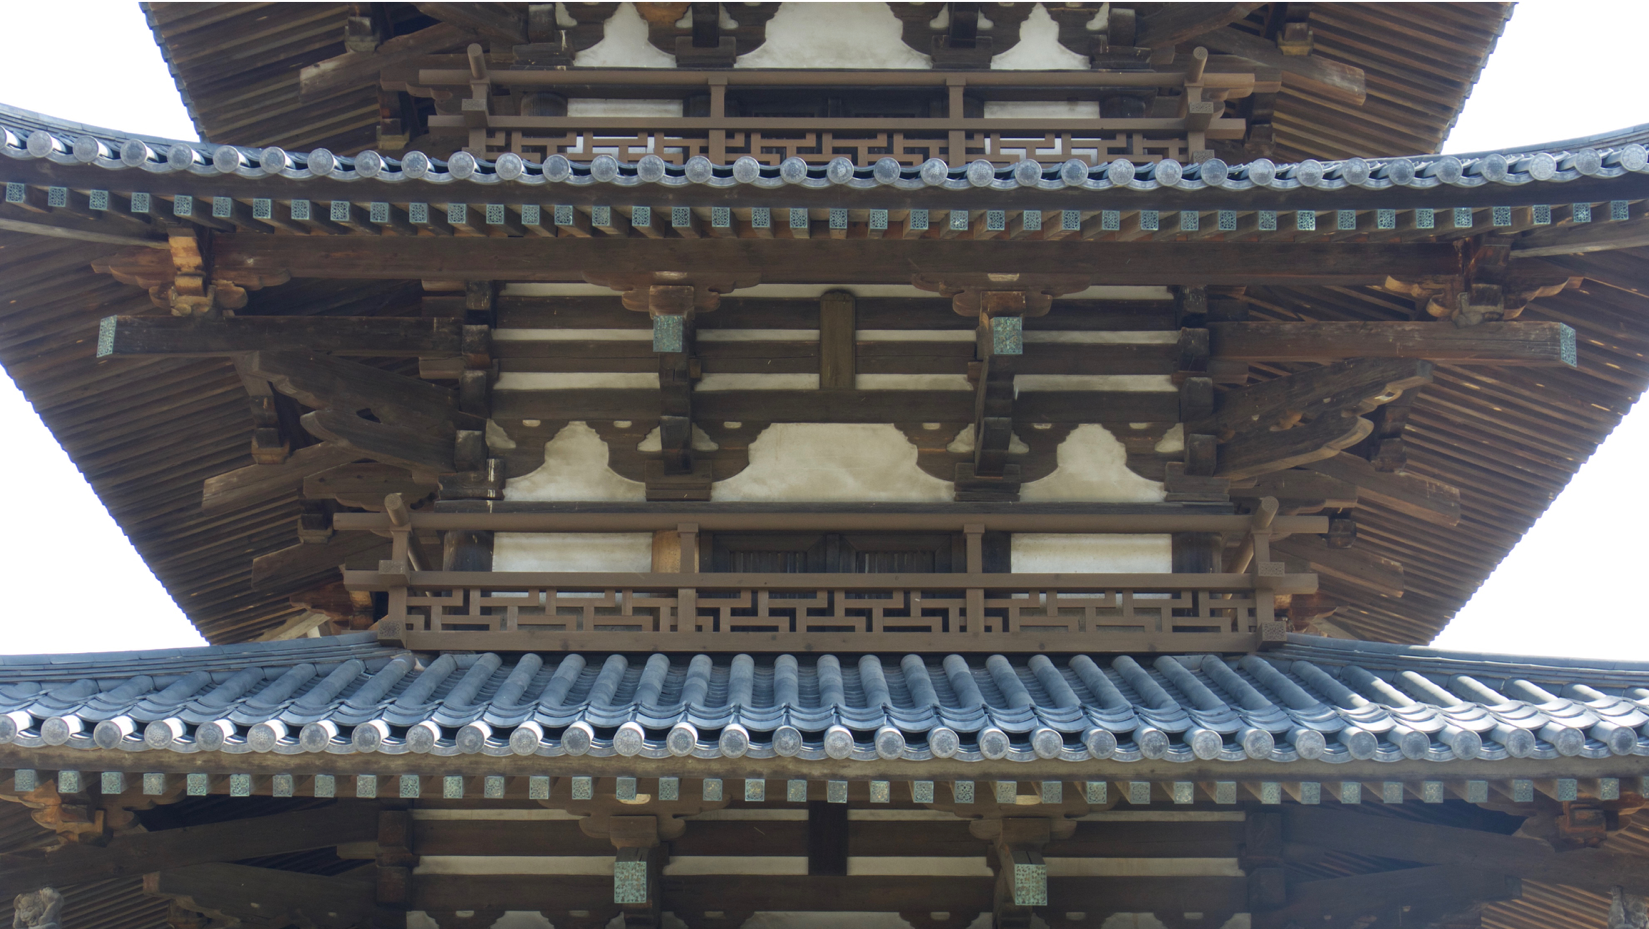 Japanese Architecture 600-1100 CE